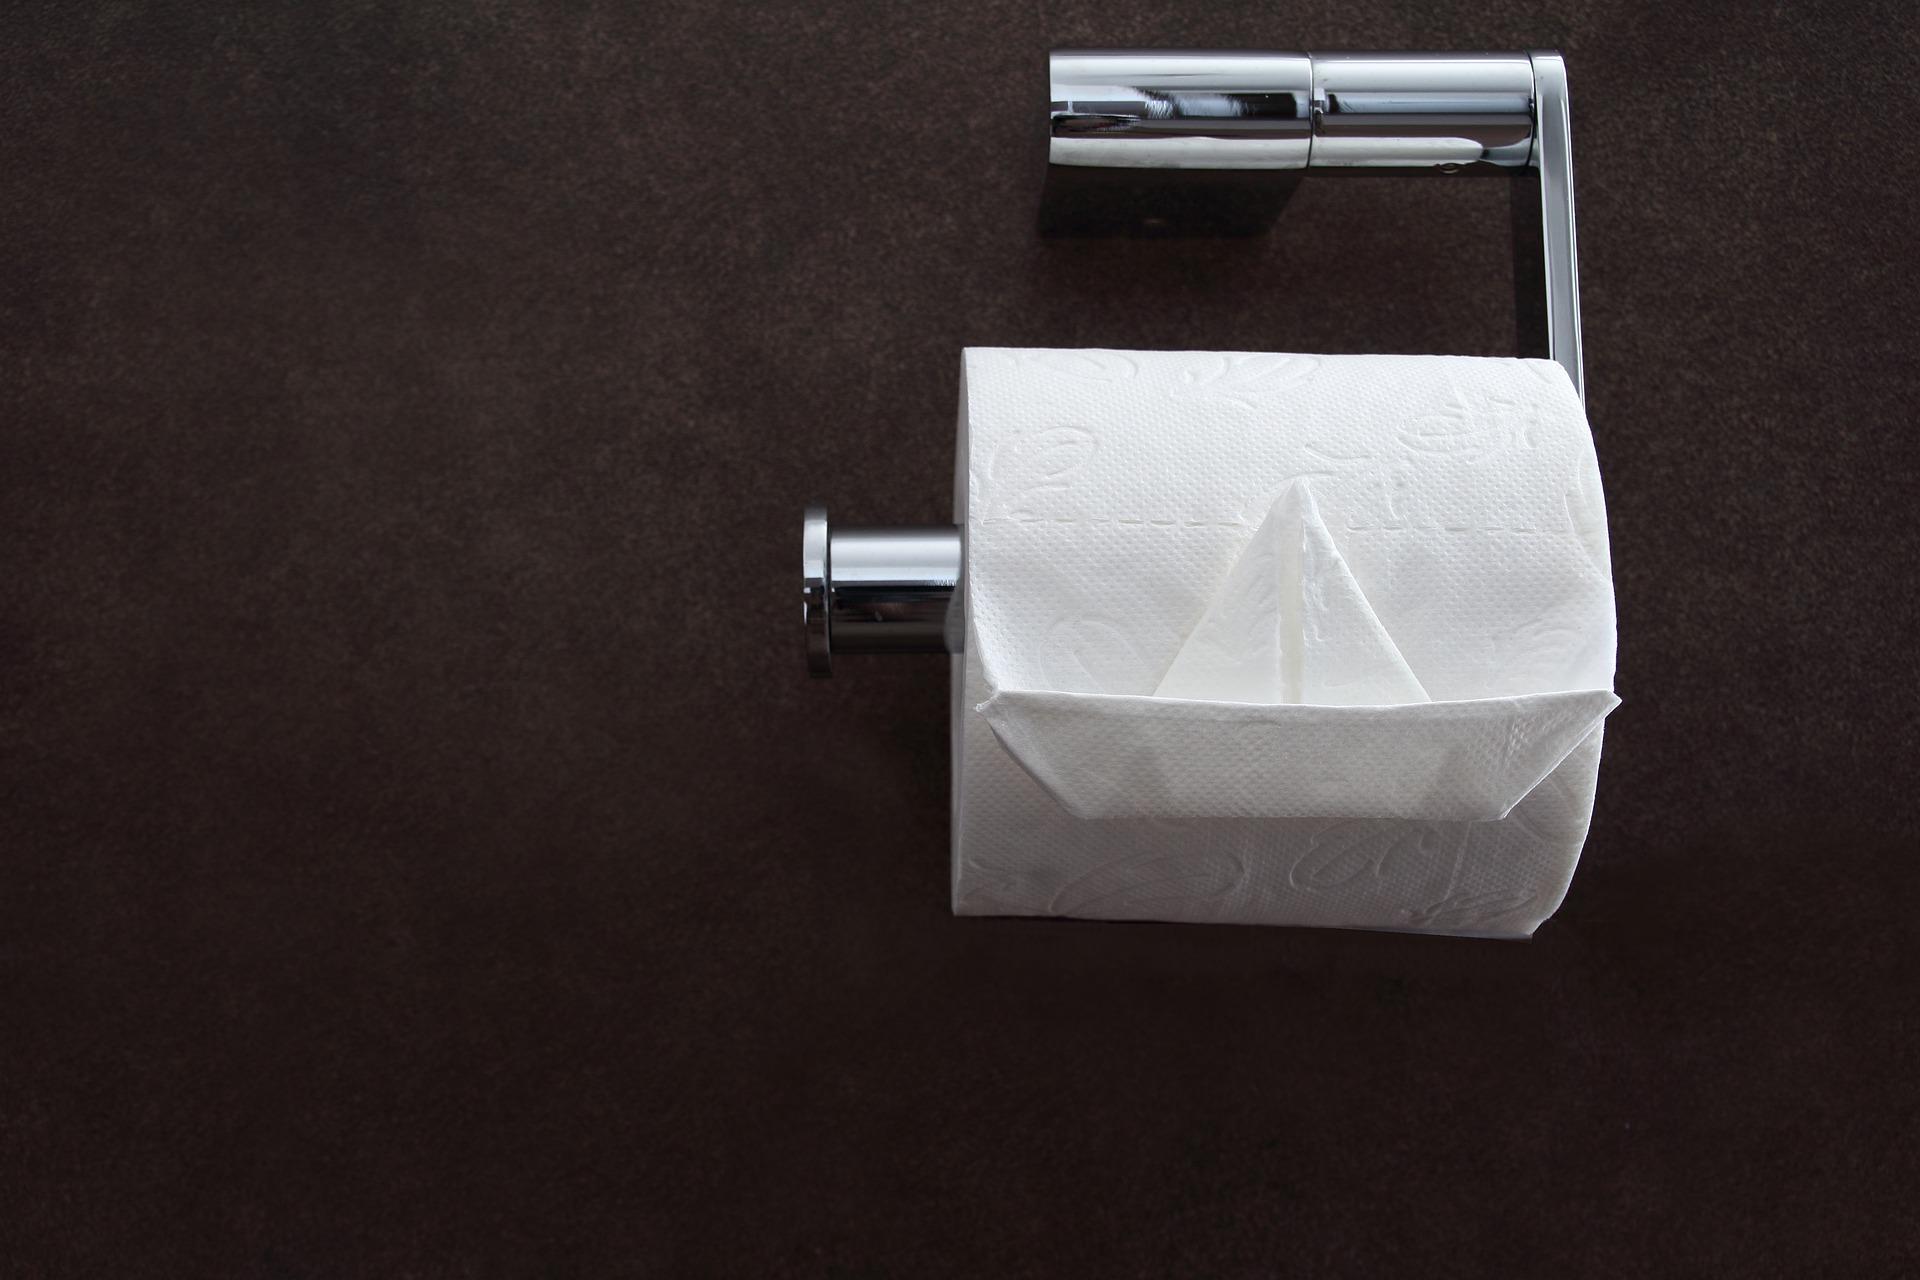 toiletrol-scex